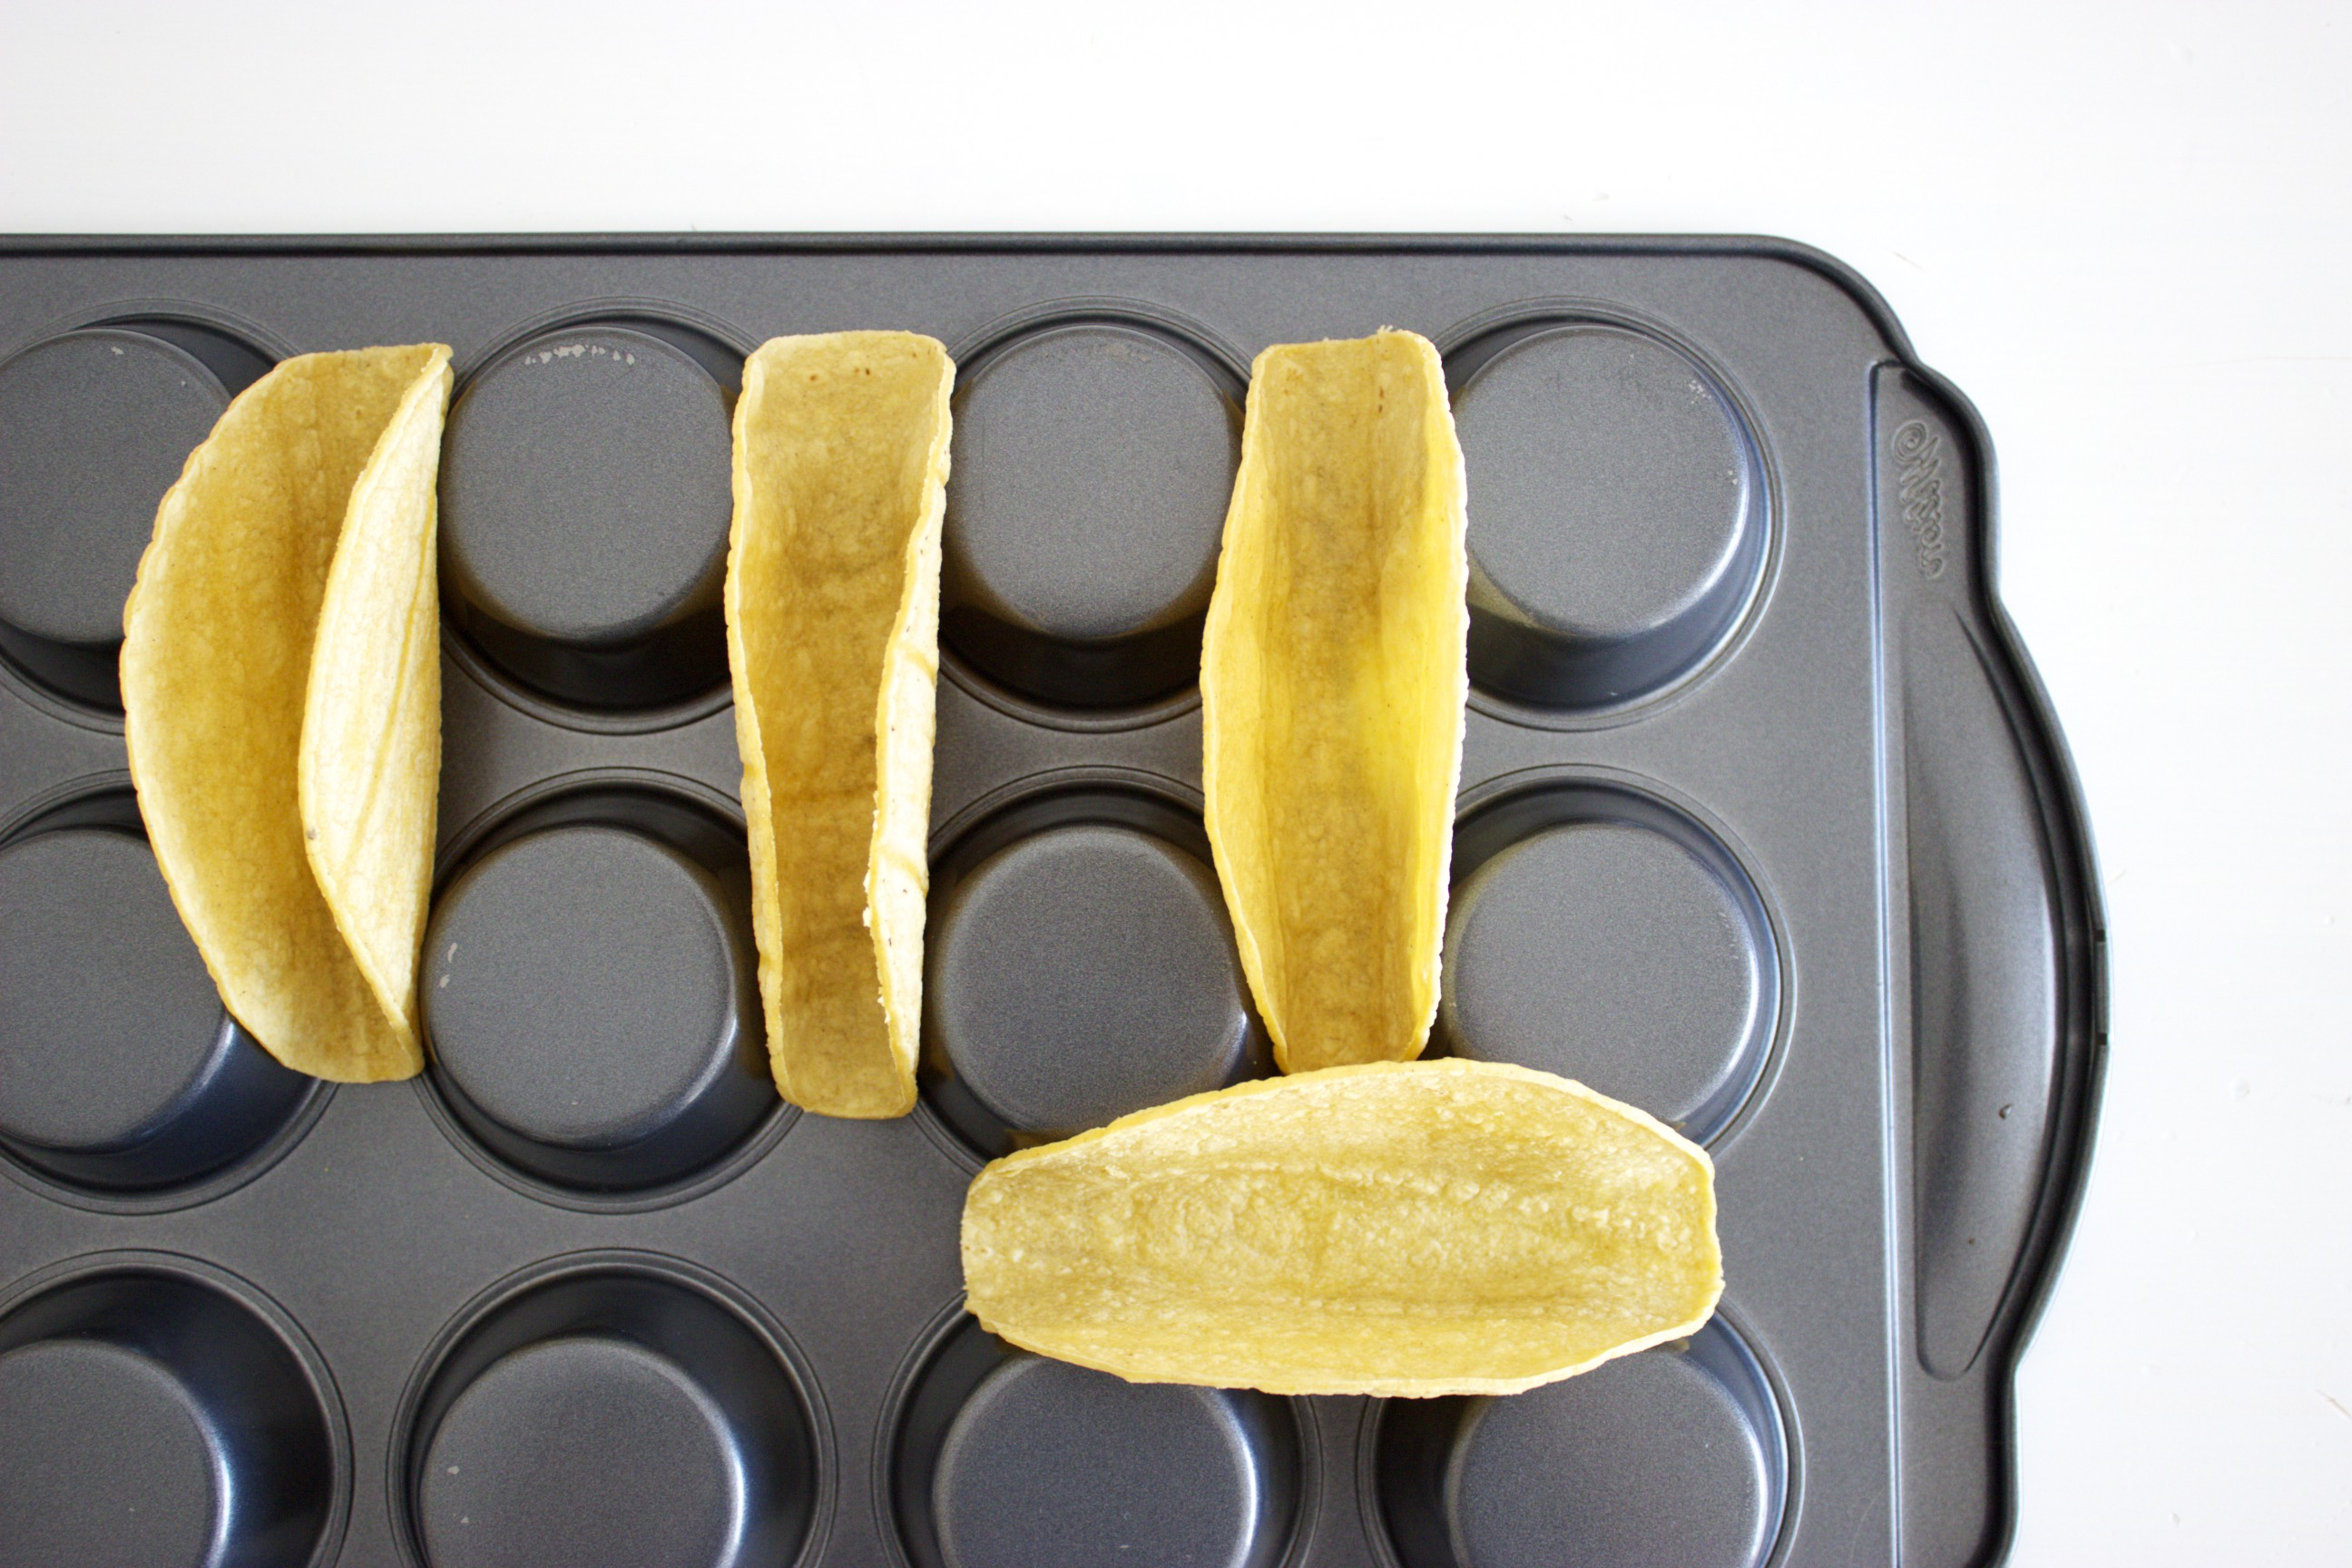 Crispy Baked Taco Shells Amp Seasoning Ks